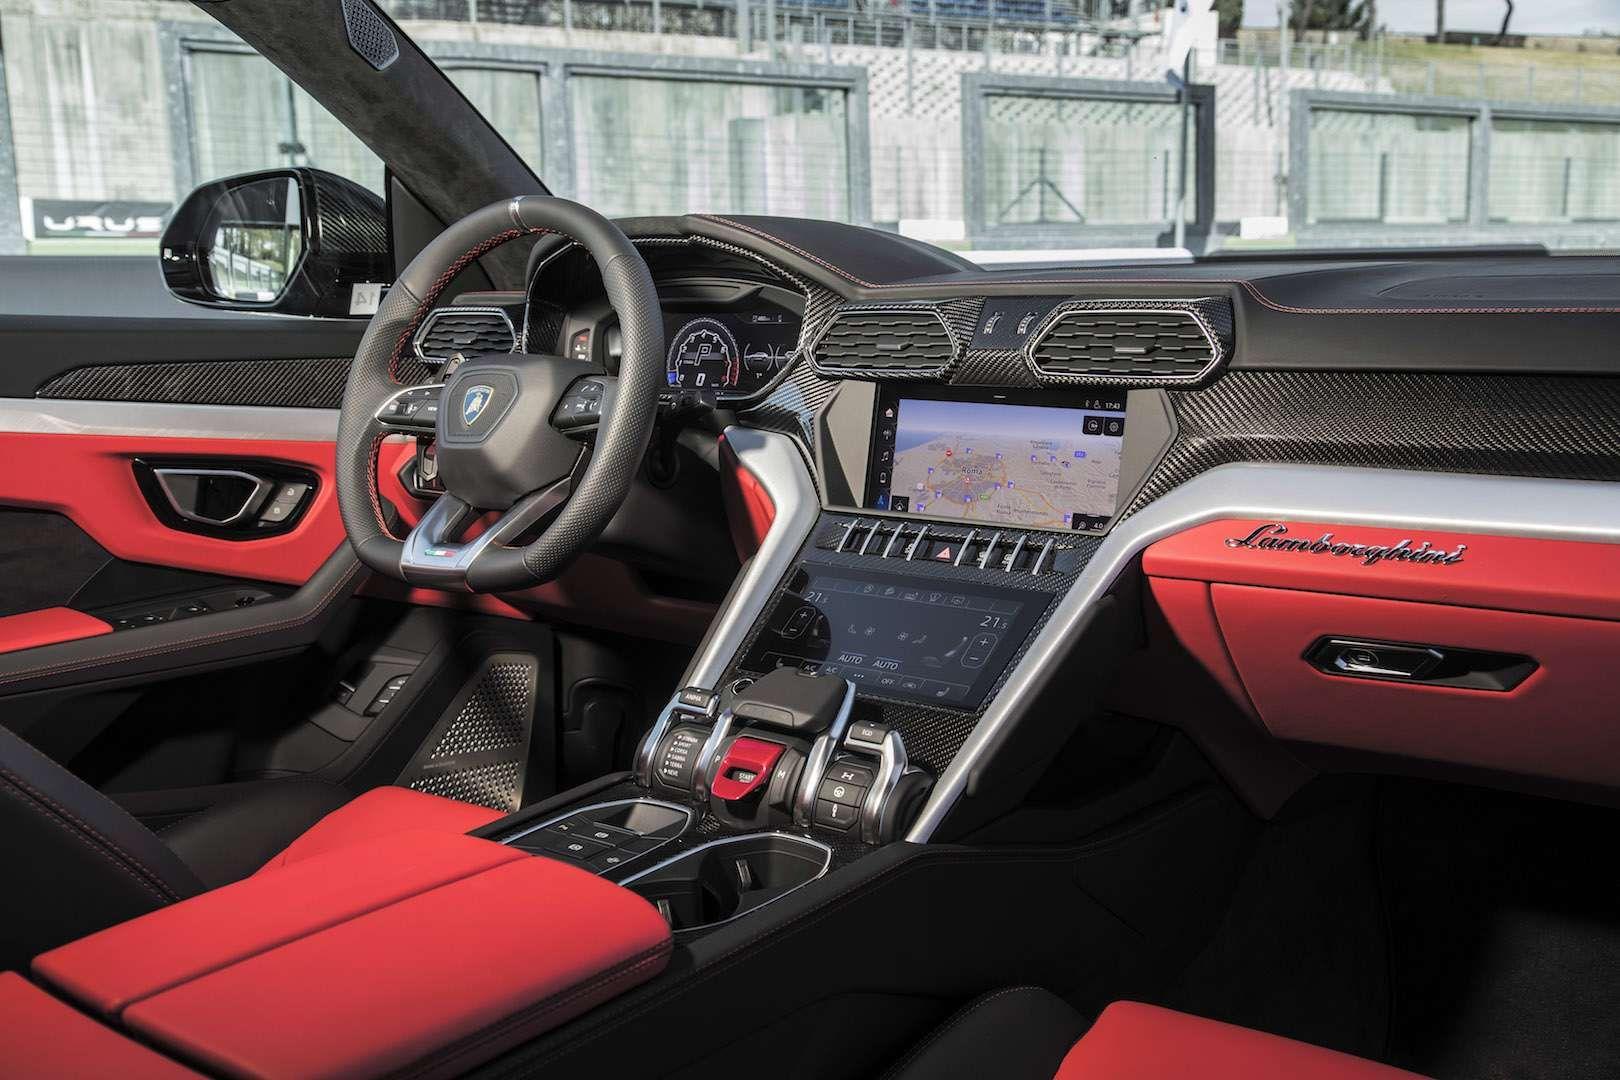 Lamborghini Urus First Drive In Italy Lambo Sets A Sizzling